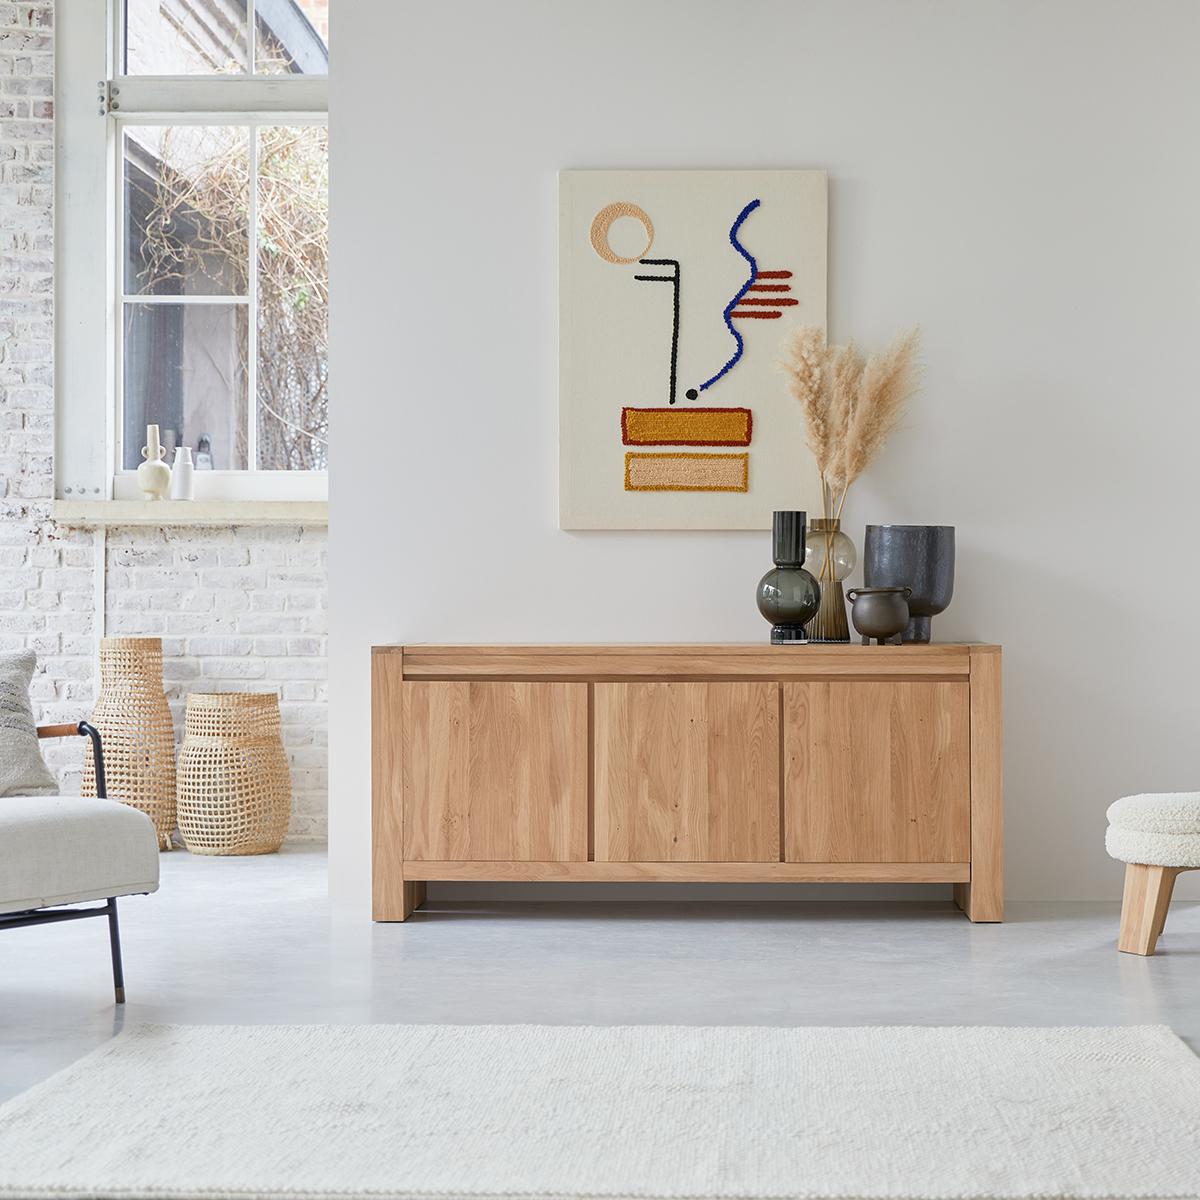 Eden solid oak Sideboard 160 cm